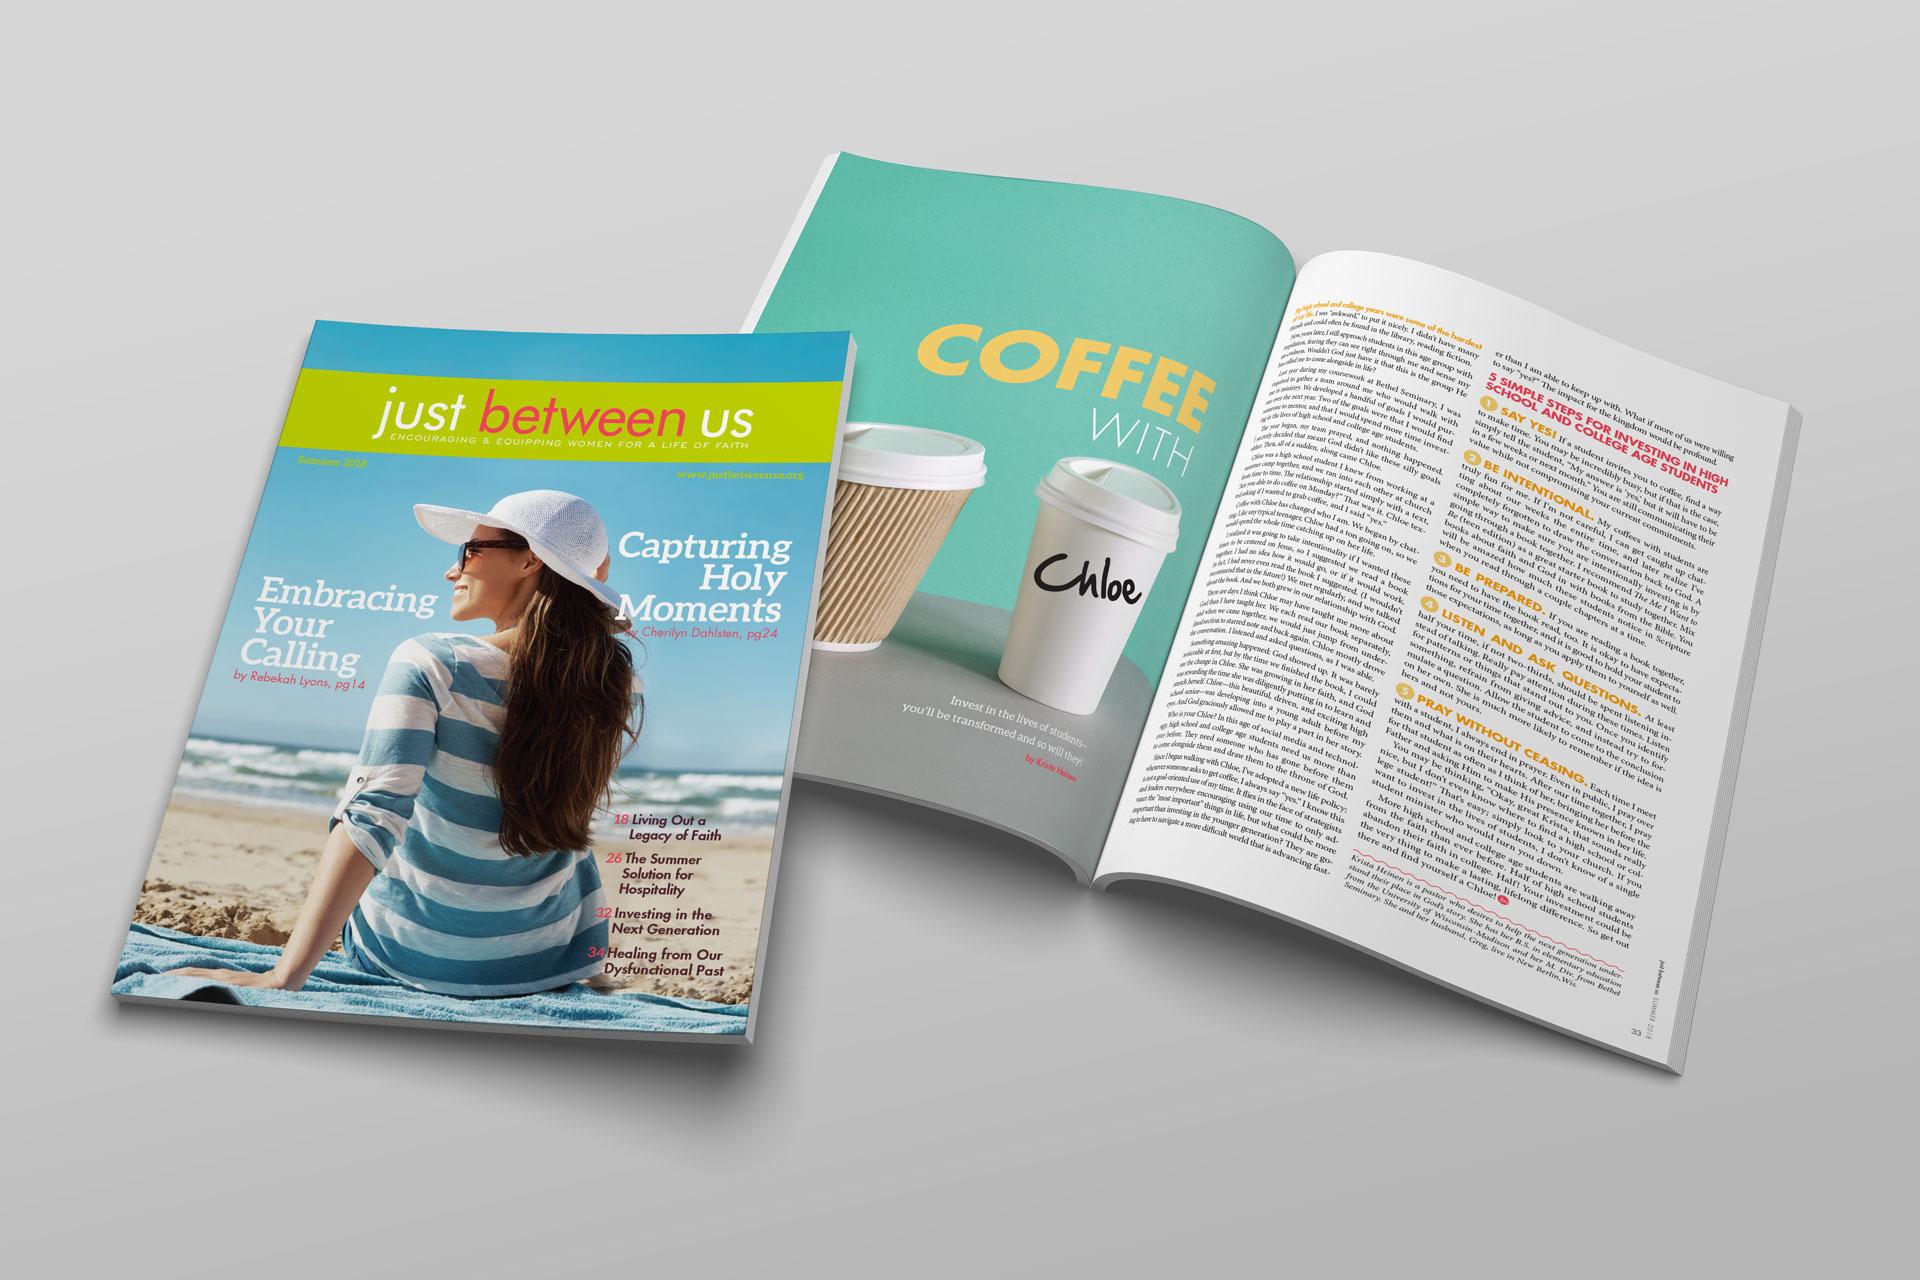 JBU-summer18-cover.jpg